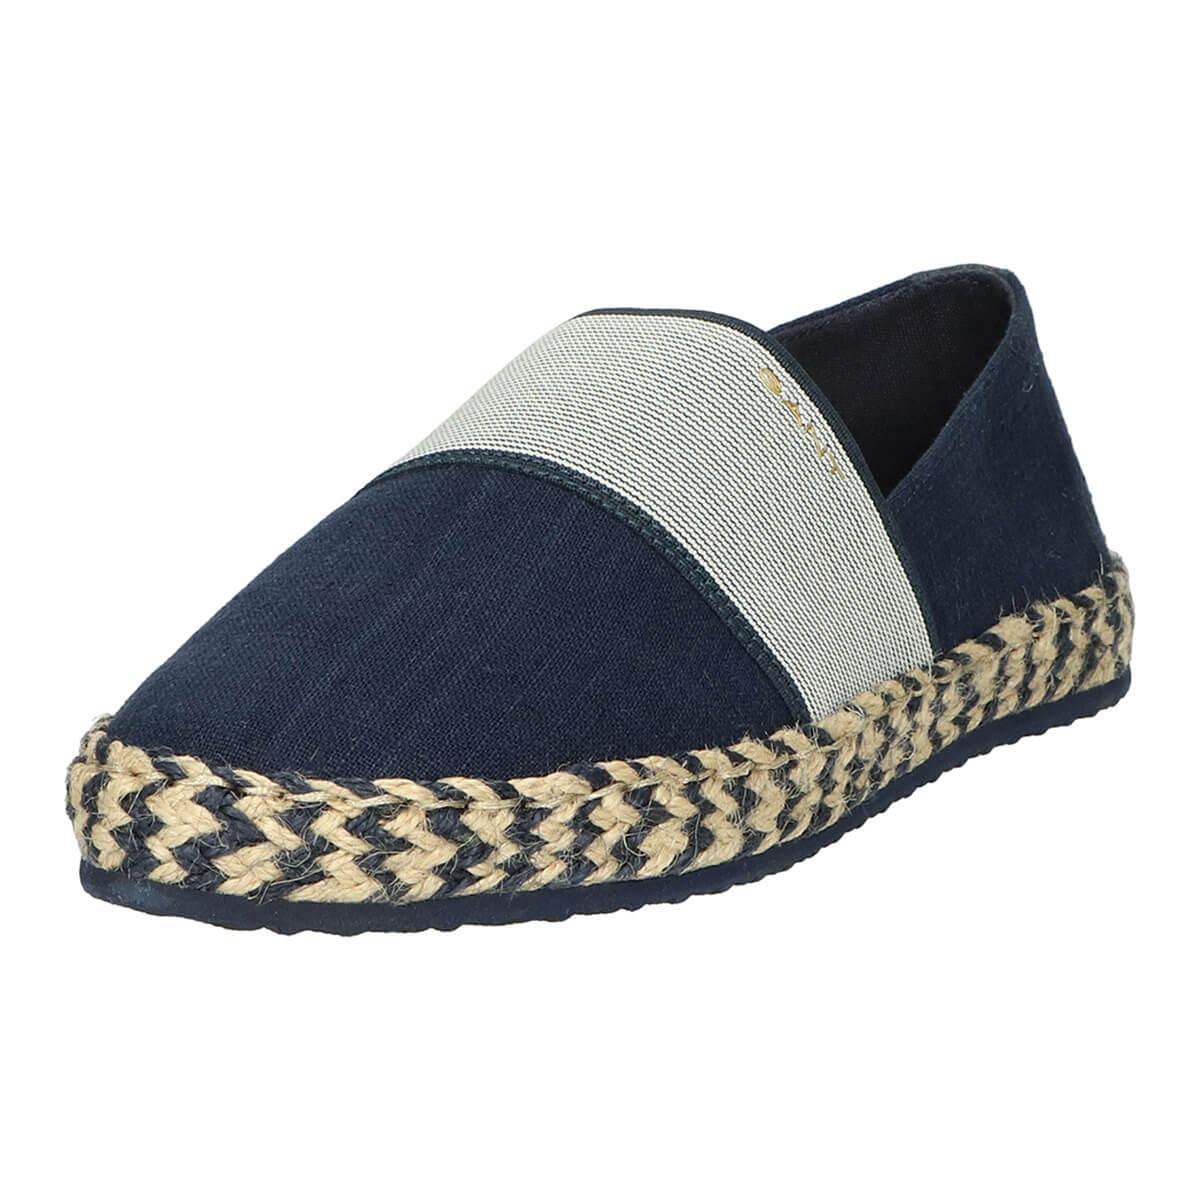 Details zu Gant Damen Schuhe Espadrilles Espandrilles Espandrillos Slipper Raffiaville